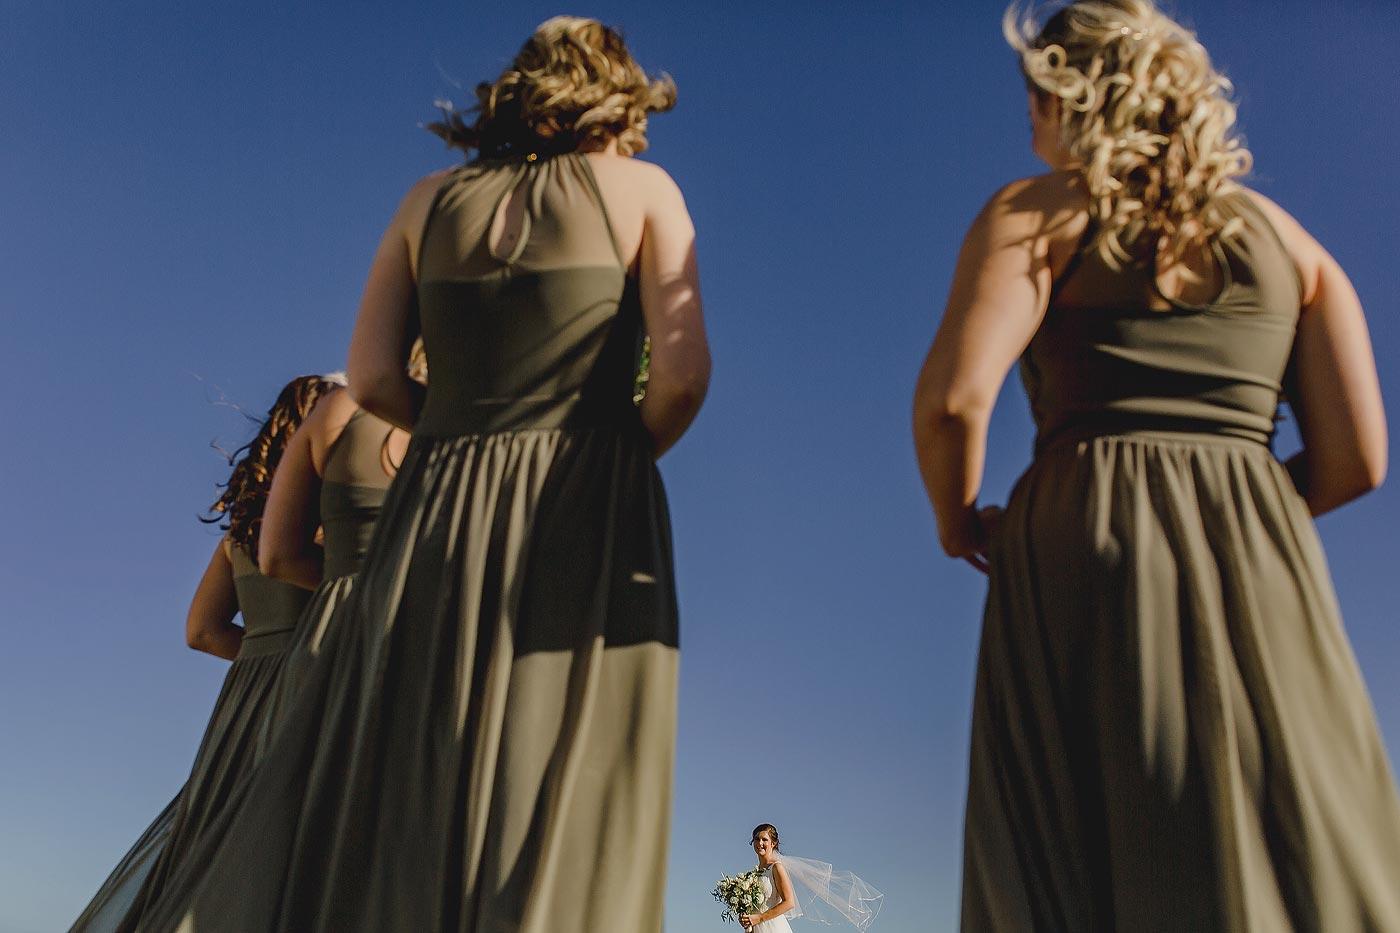 Copy of Creative Bride and Bridesmaids Portrait during a winter wedding.